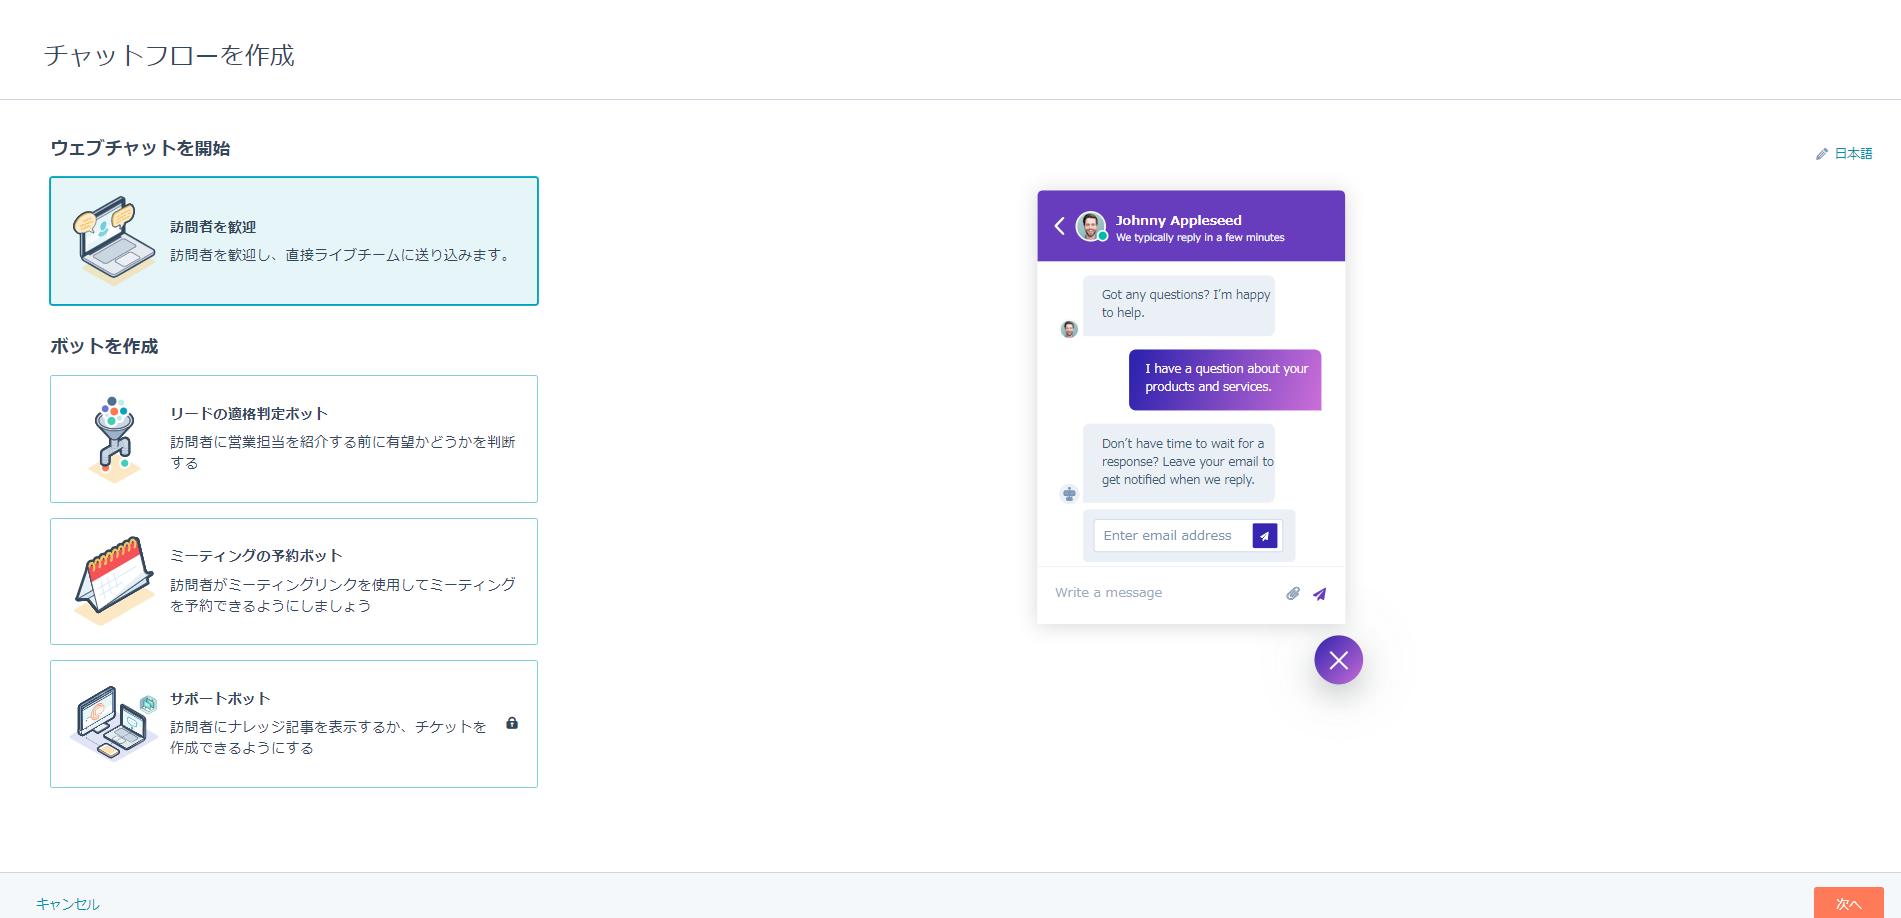 marketing-chat-bot-hubspot-customer-support_setting_04